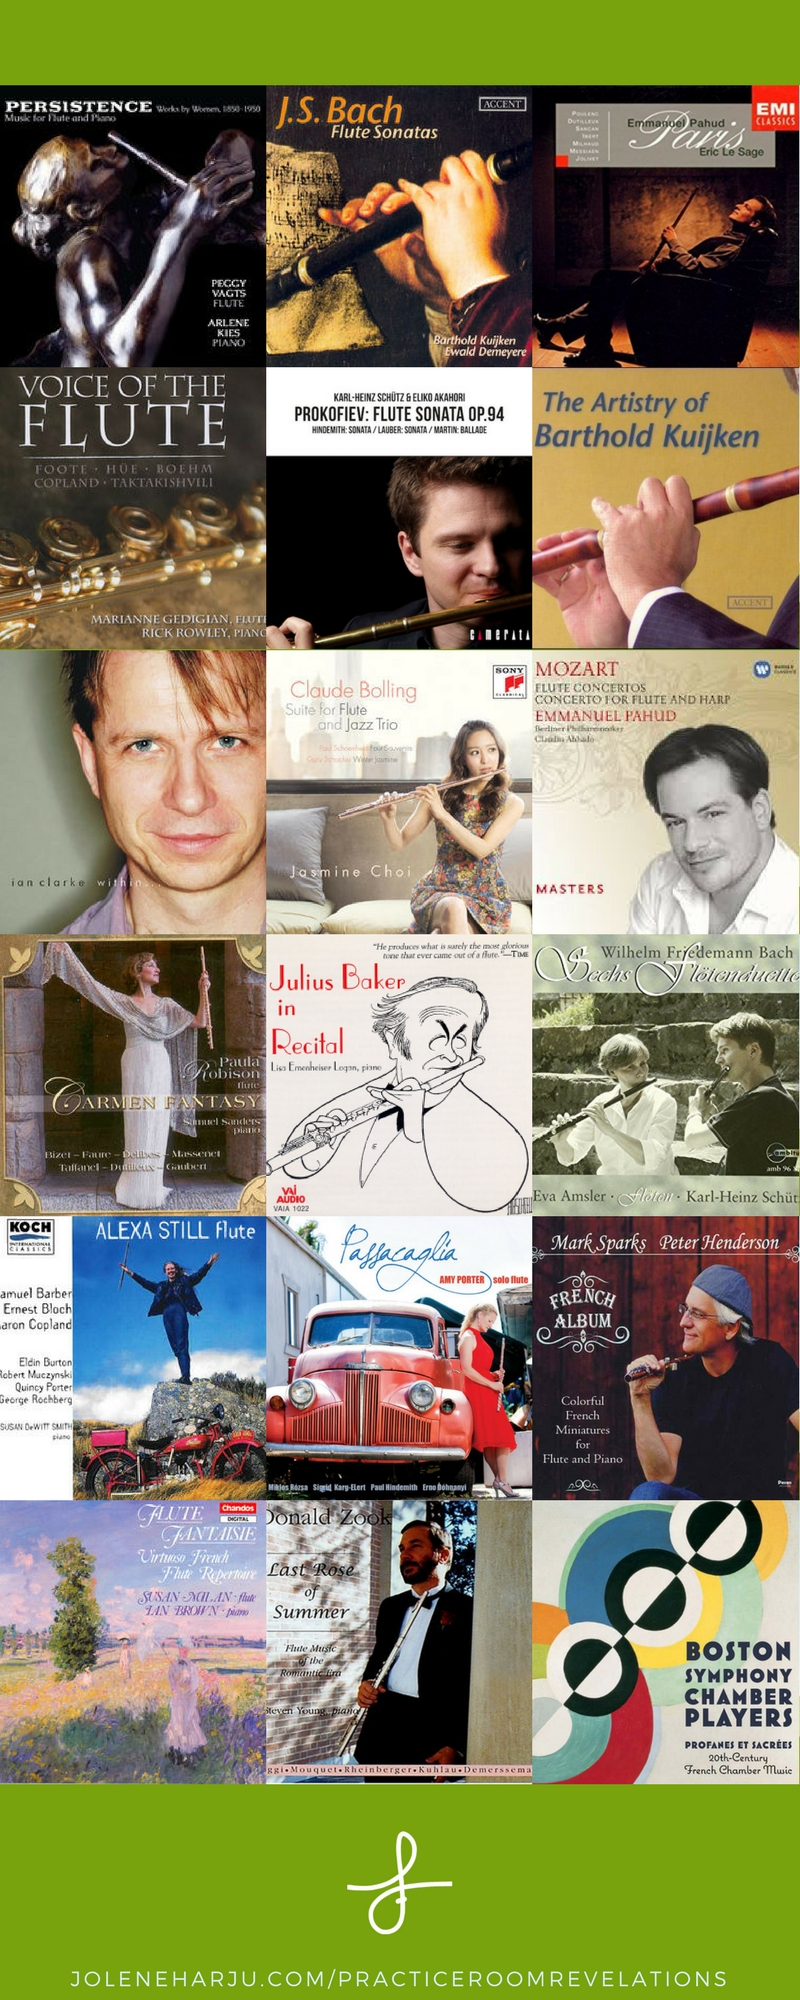 My Top 17 Inspirational Flute Recordings — Jolene Madewell